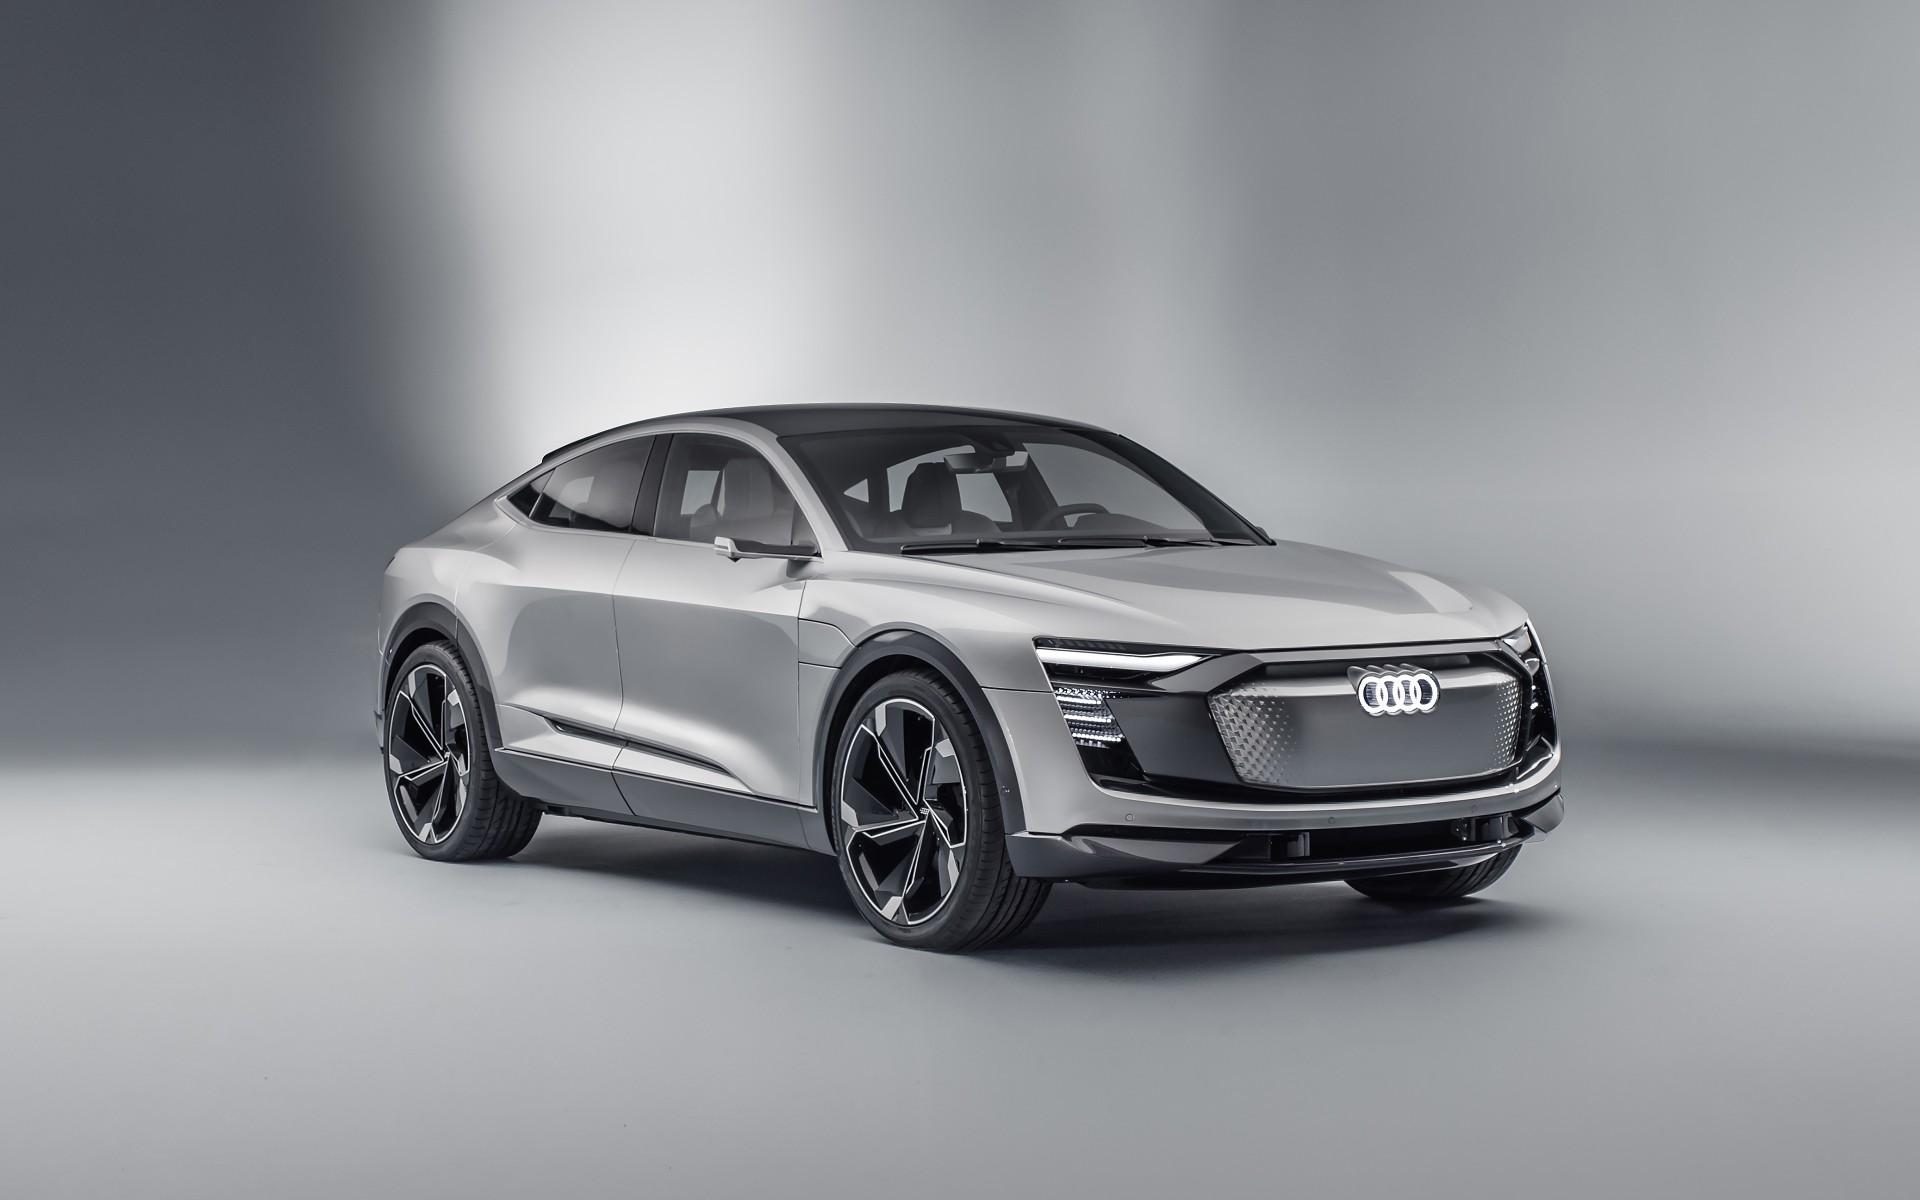 2017 Audi E Tron Sportback Concept Car 4K Wallpapers HD